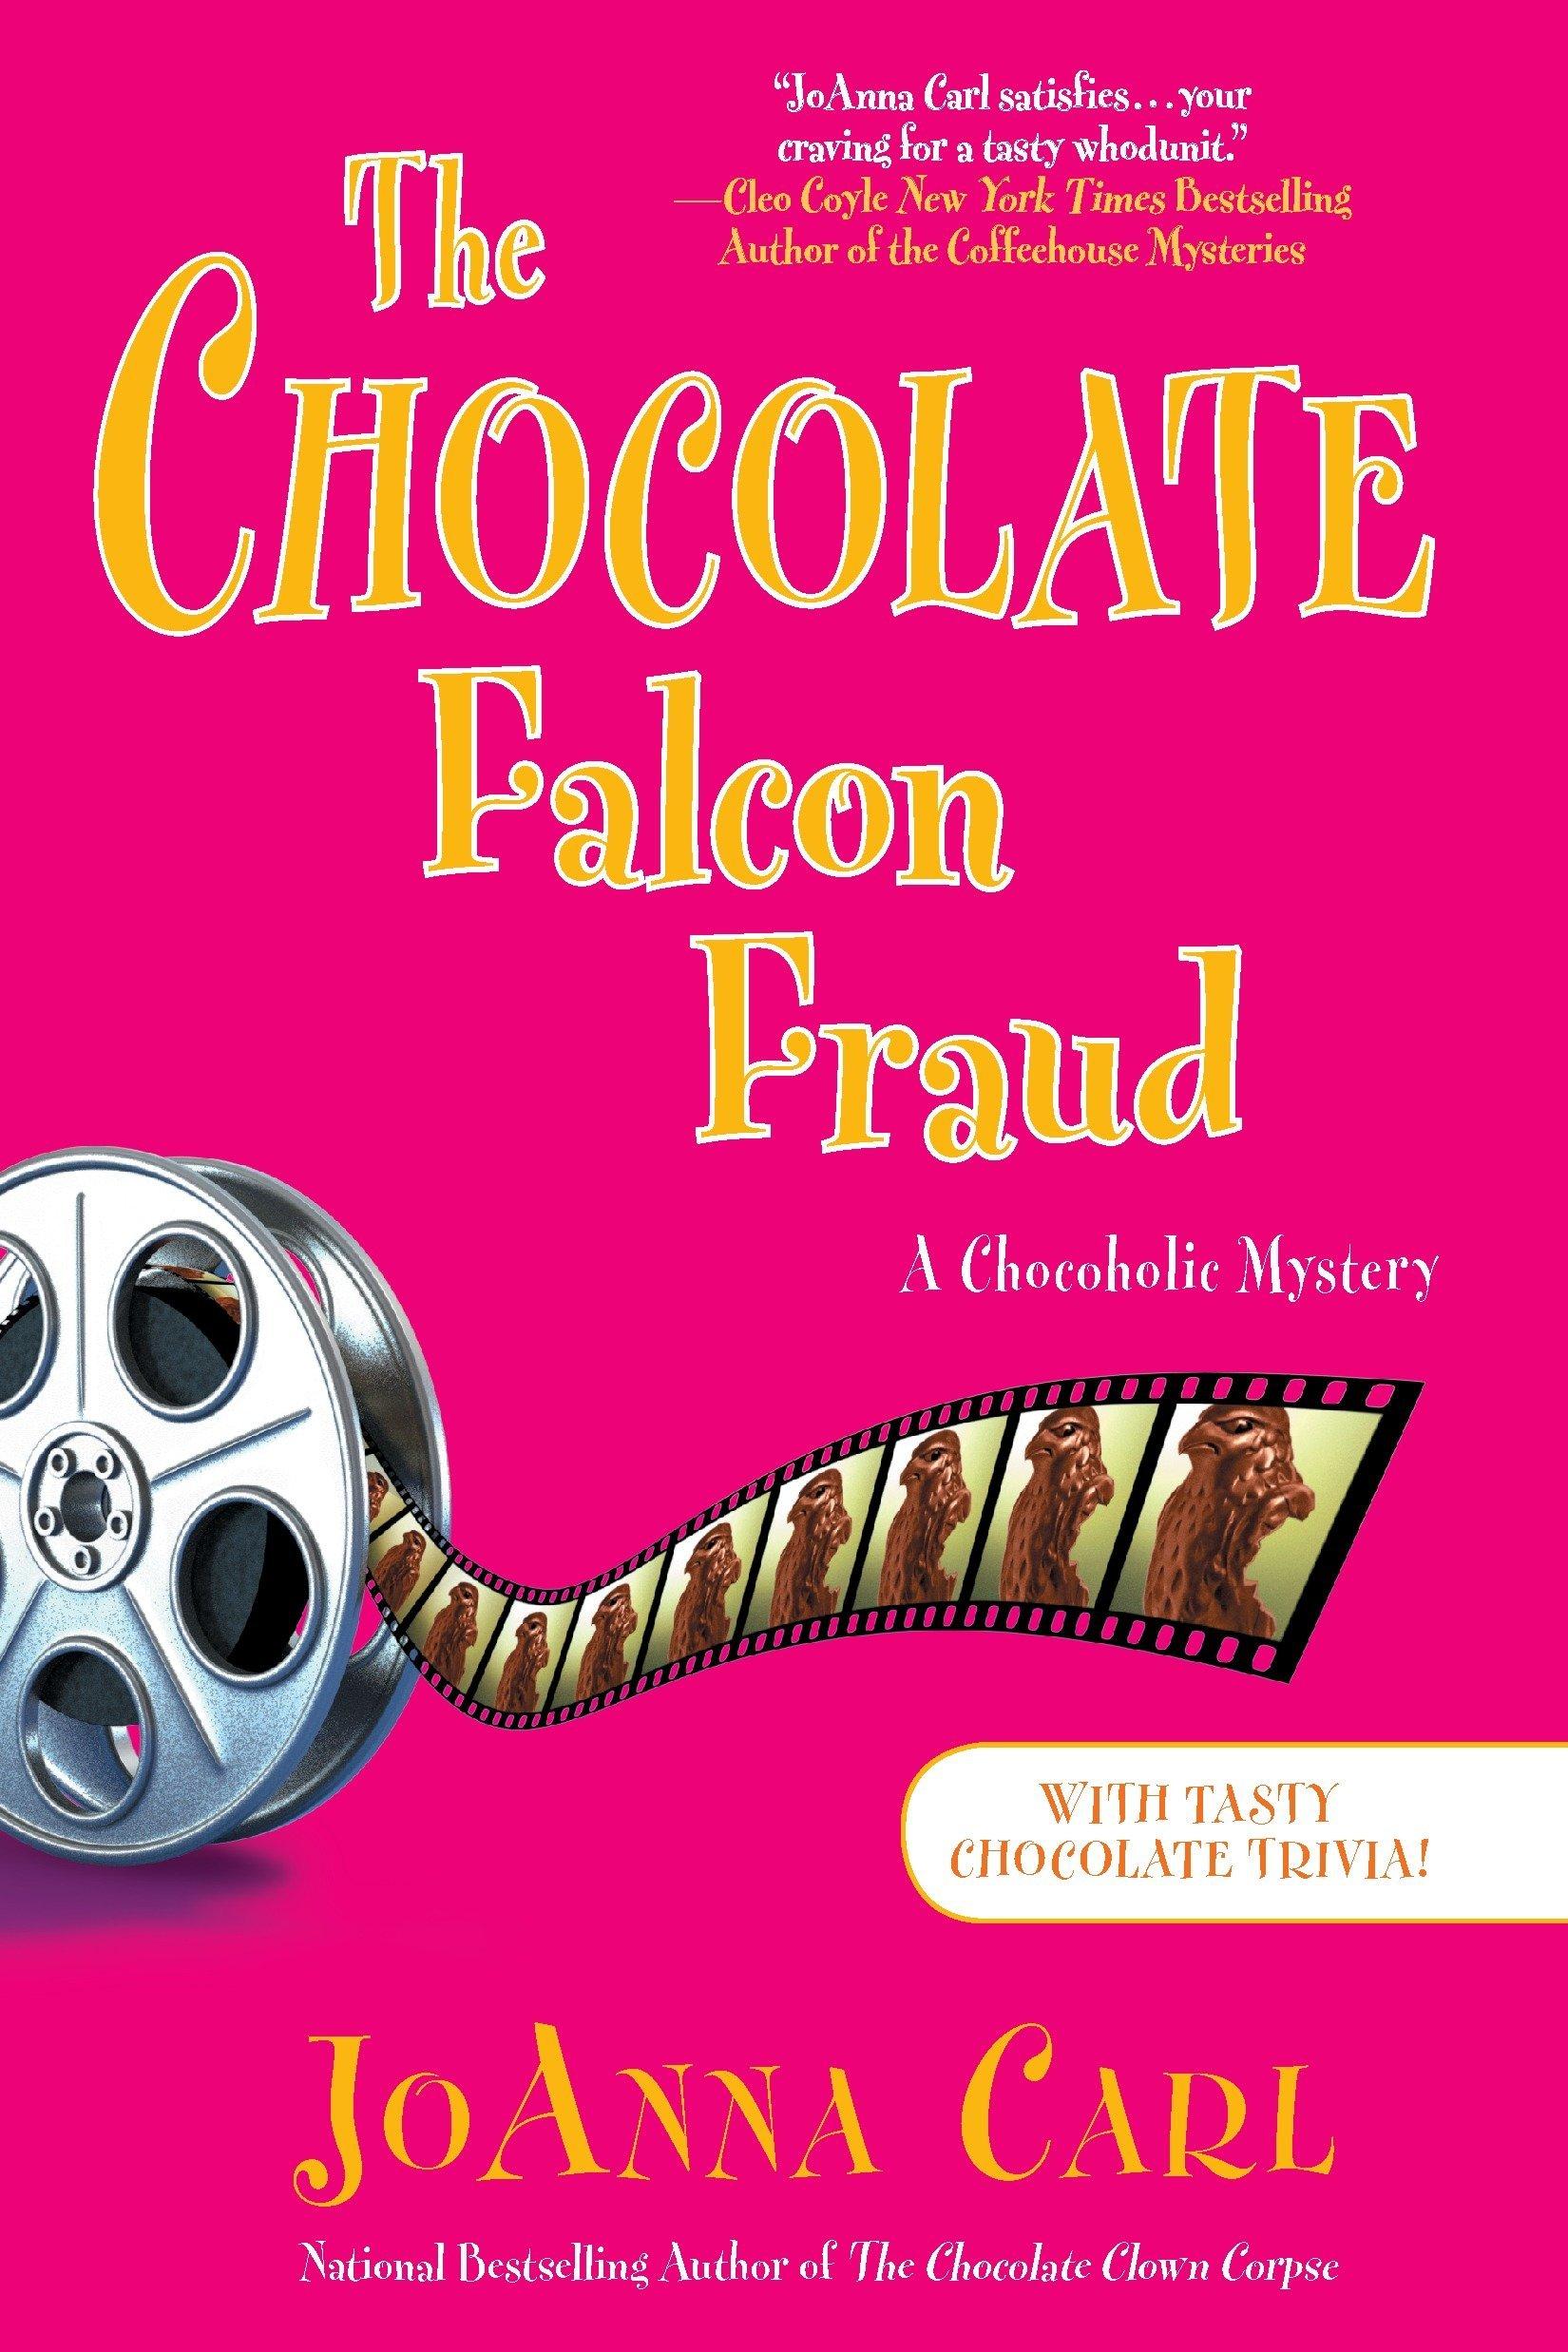 Amazon fr - The Chocolate Falcon Fraud - JoAnna Carl - Livres